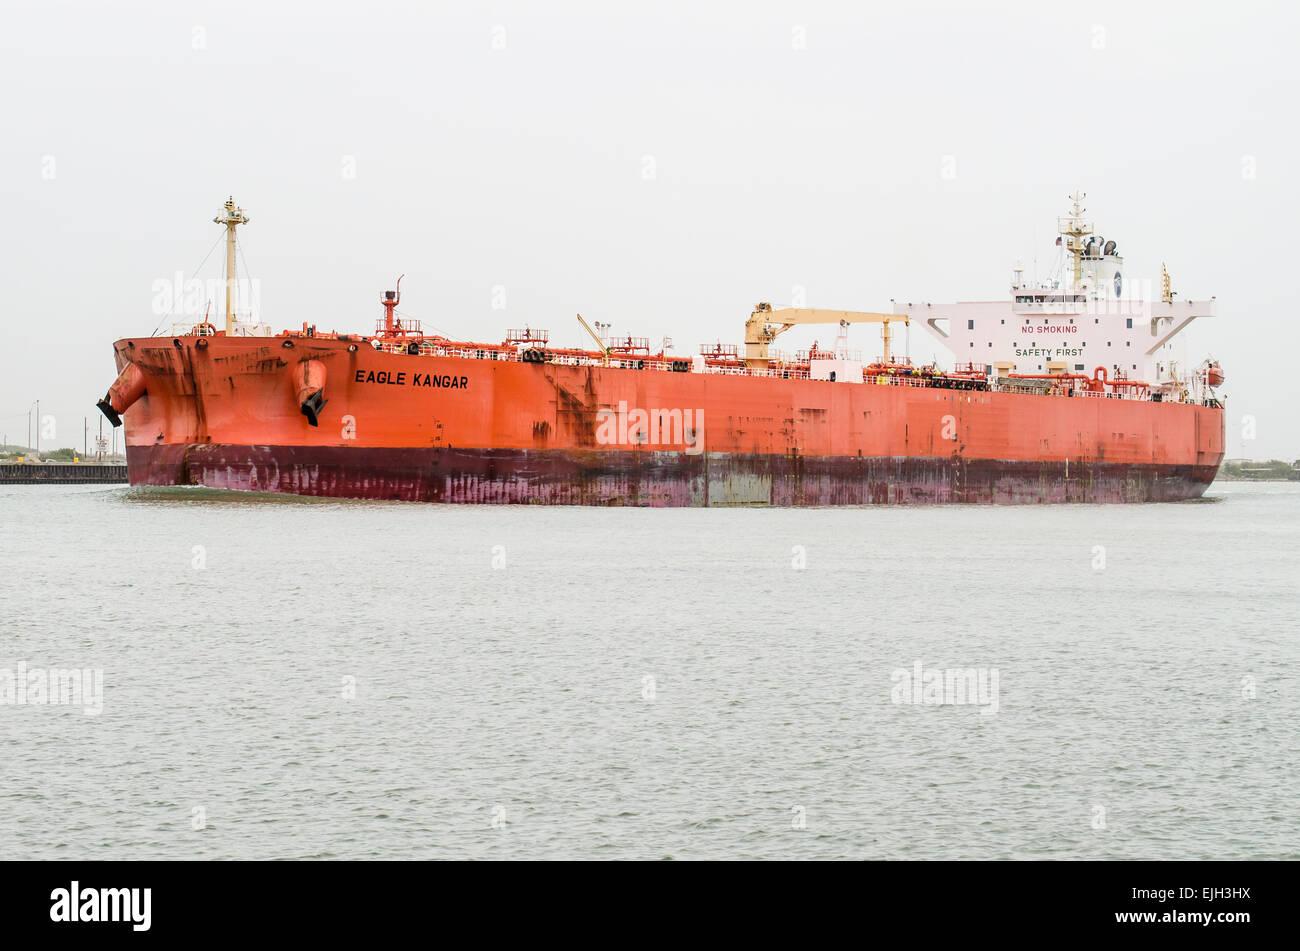 EAGLE KANGAR CRUDE OIL TANKER Gross Tonnage: 60379 Built: 2010 Flag: SINGAPORE - Stock Image